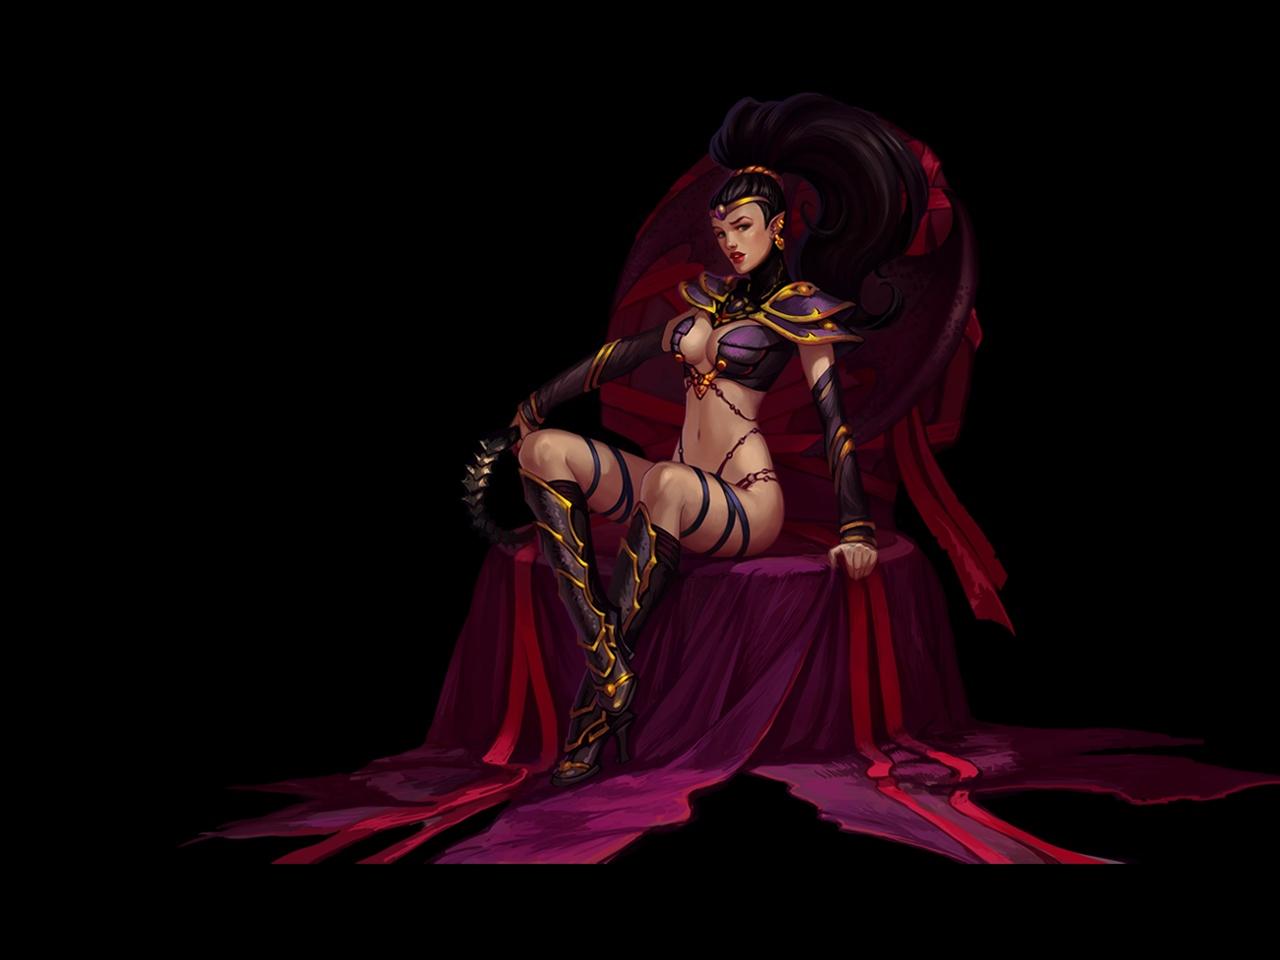 interface_textures.kfs Hero1.jpg - King's Bounty: Dark Side